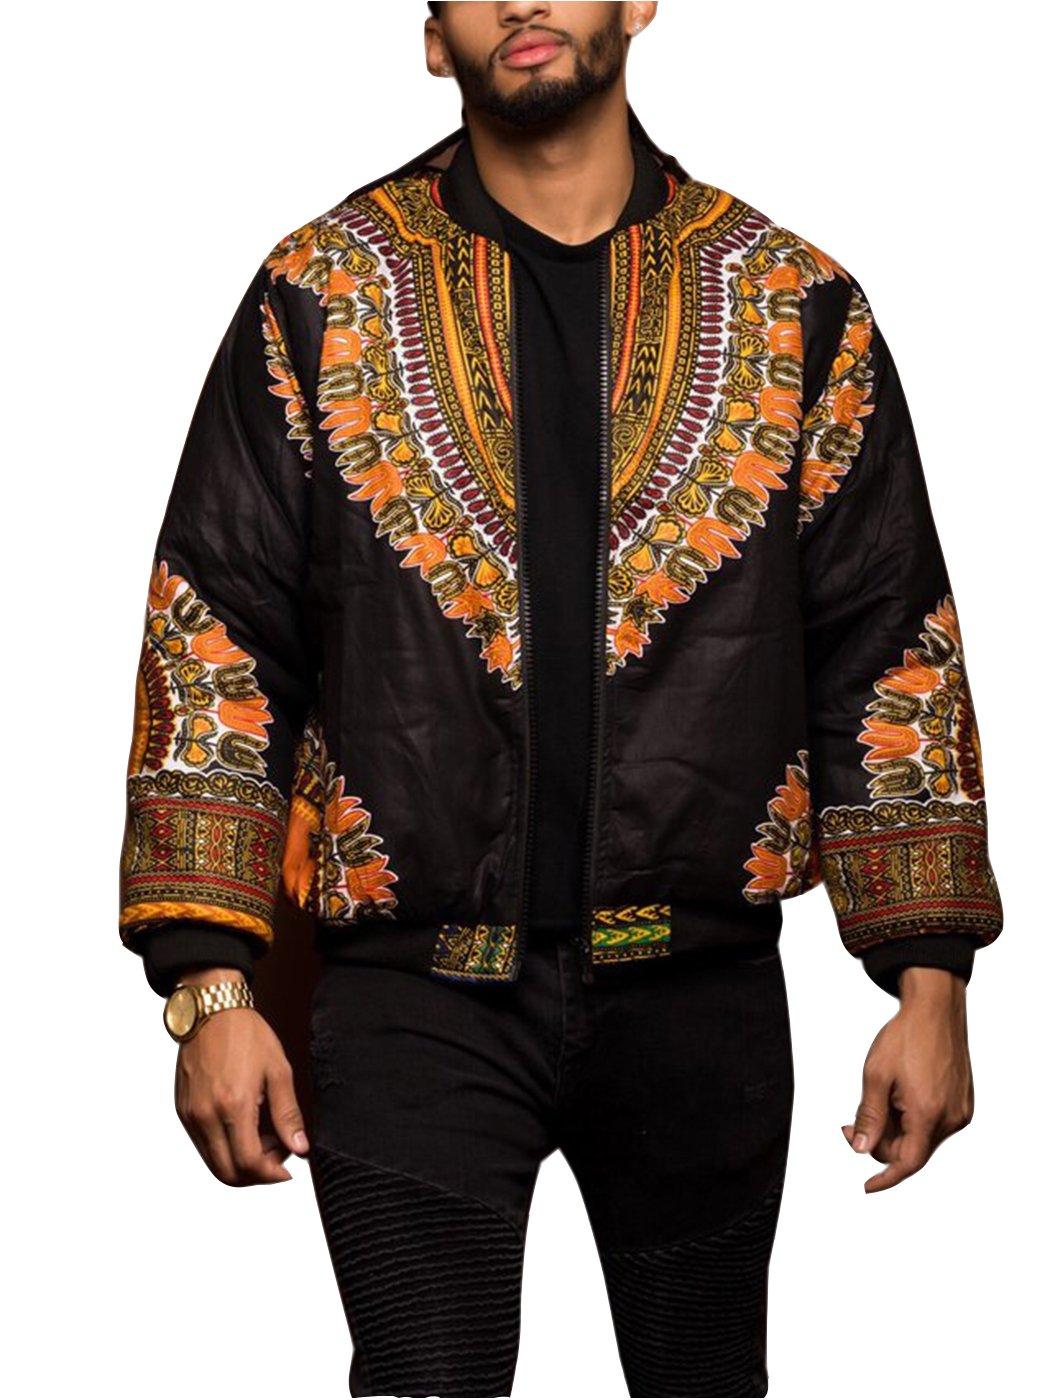 FEIYOUNG Men Floral Printed Dashiki Jacket Long Zipper up Coat